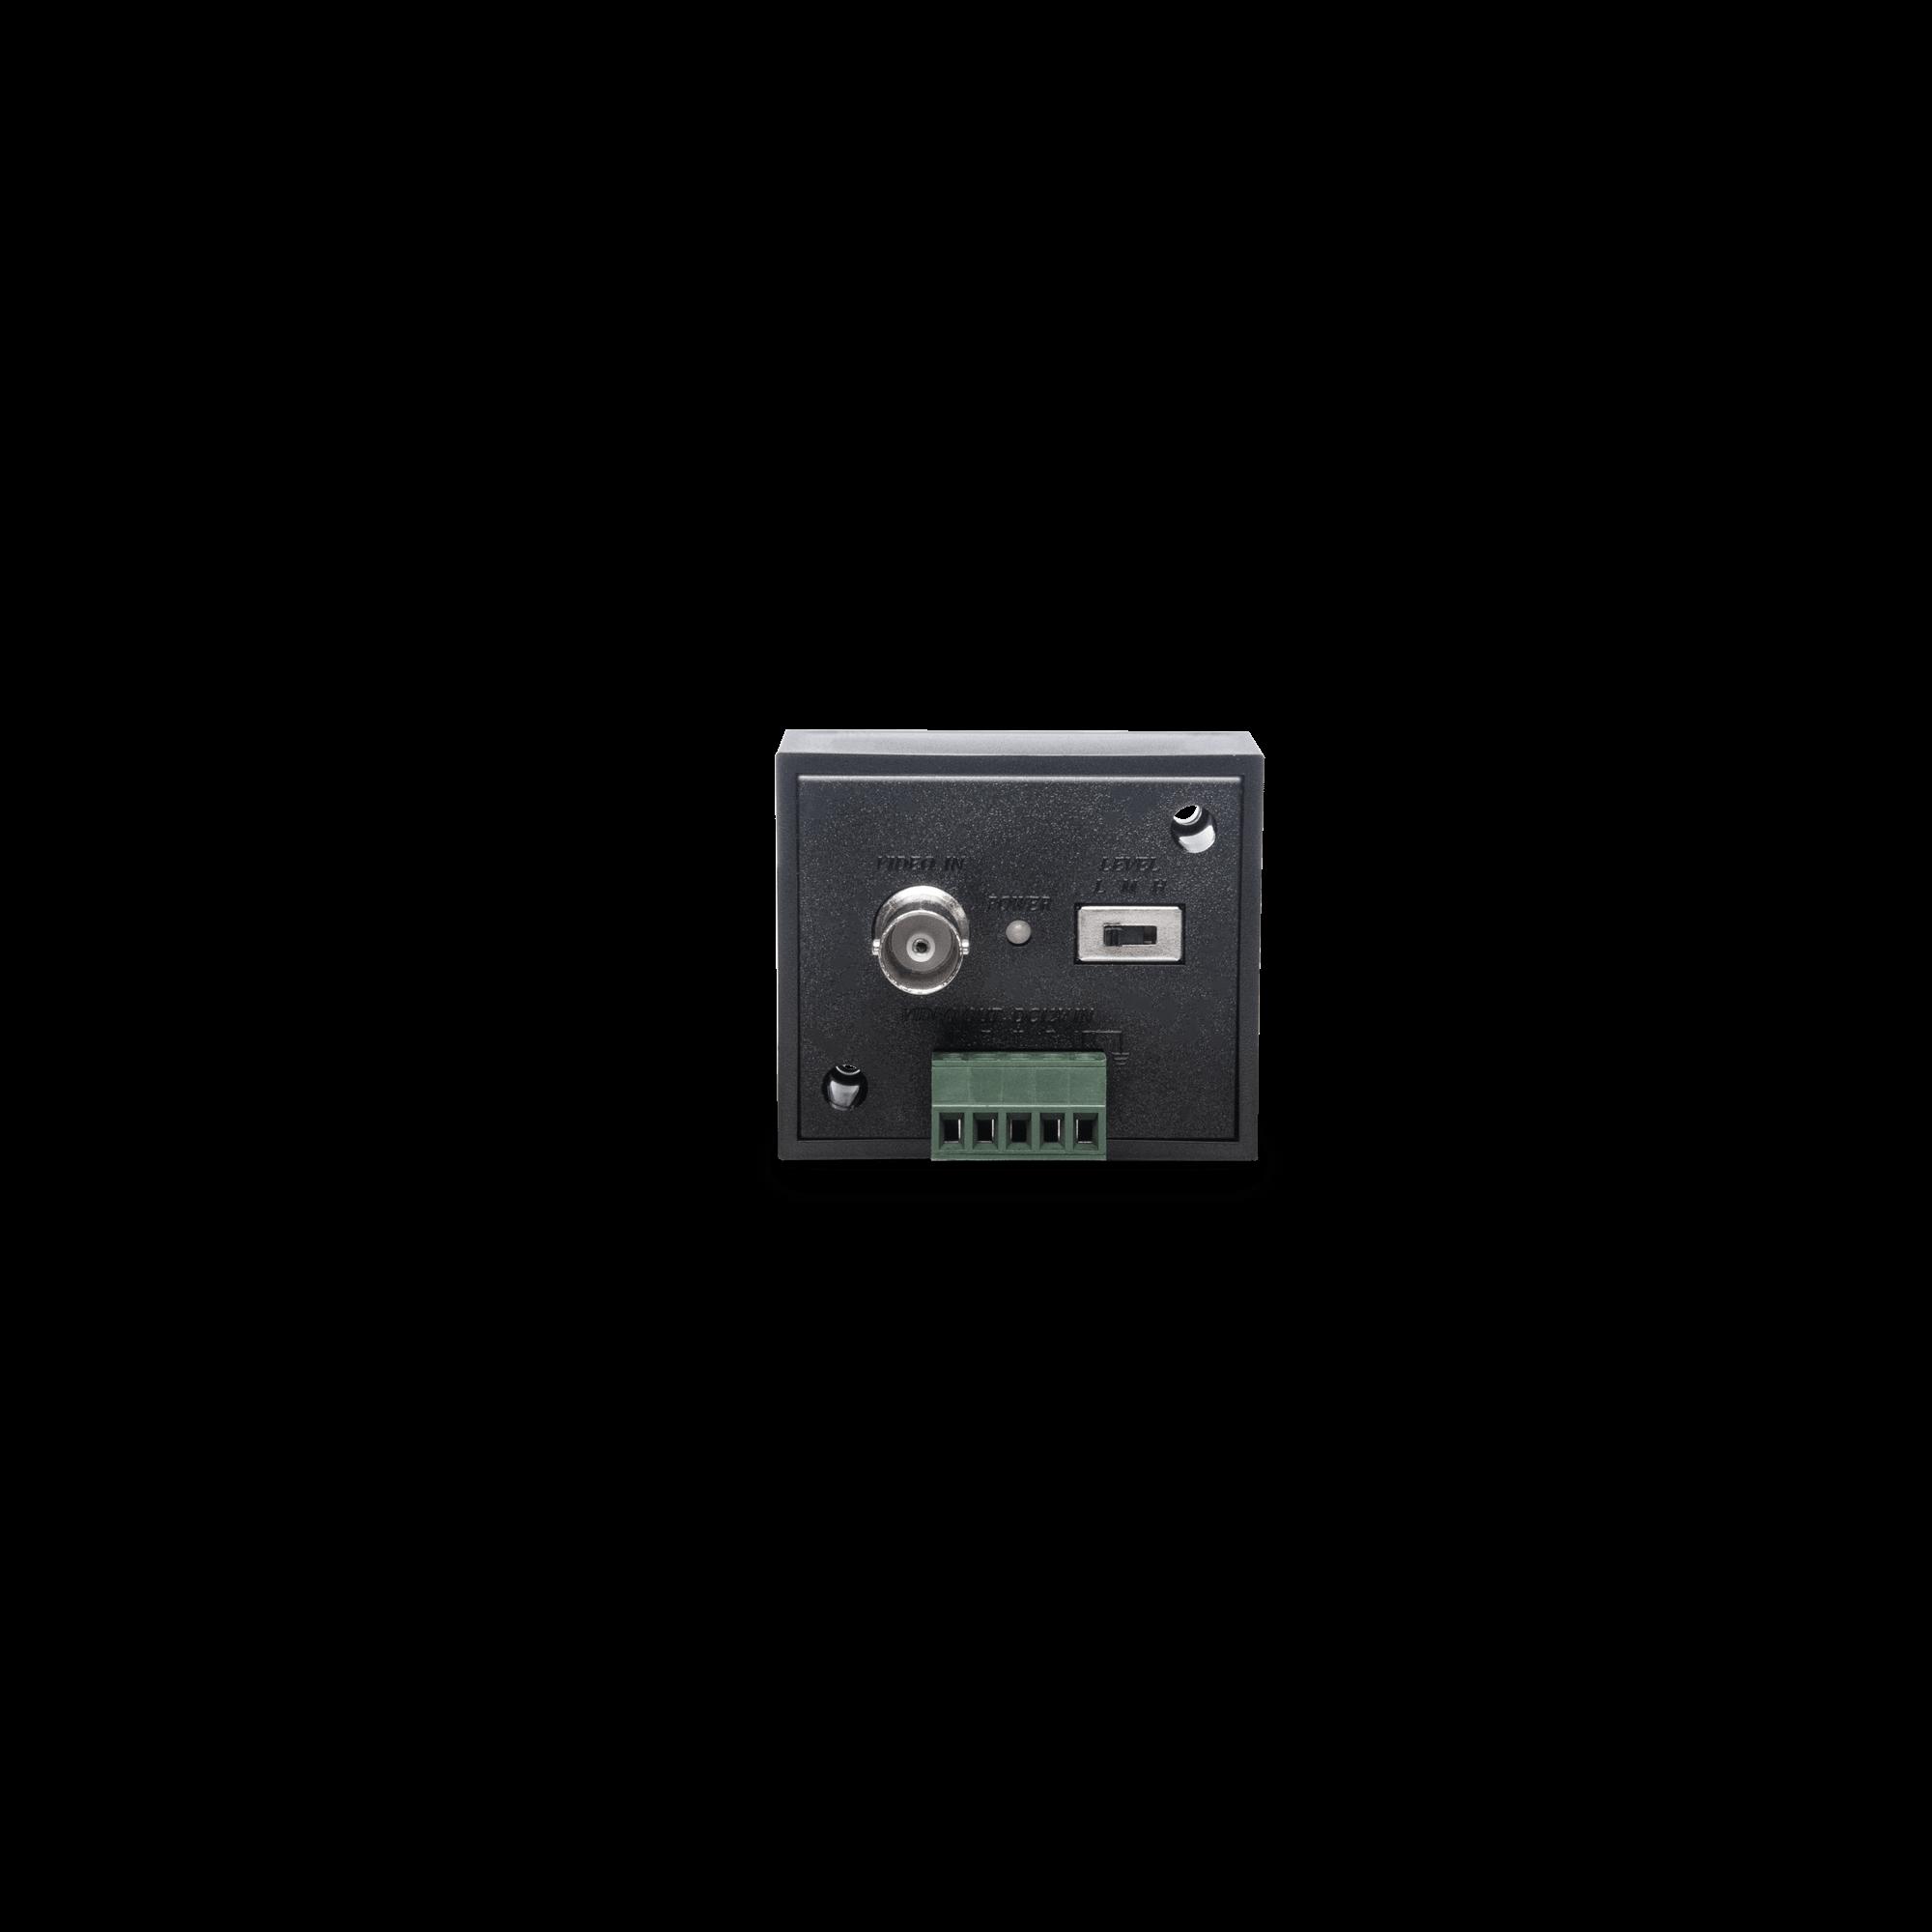 HD-TVI/AHD/HDCVI/CVBS UTP Active Transceiver